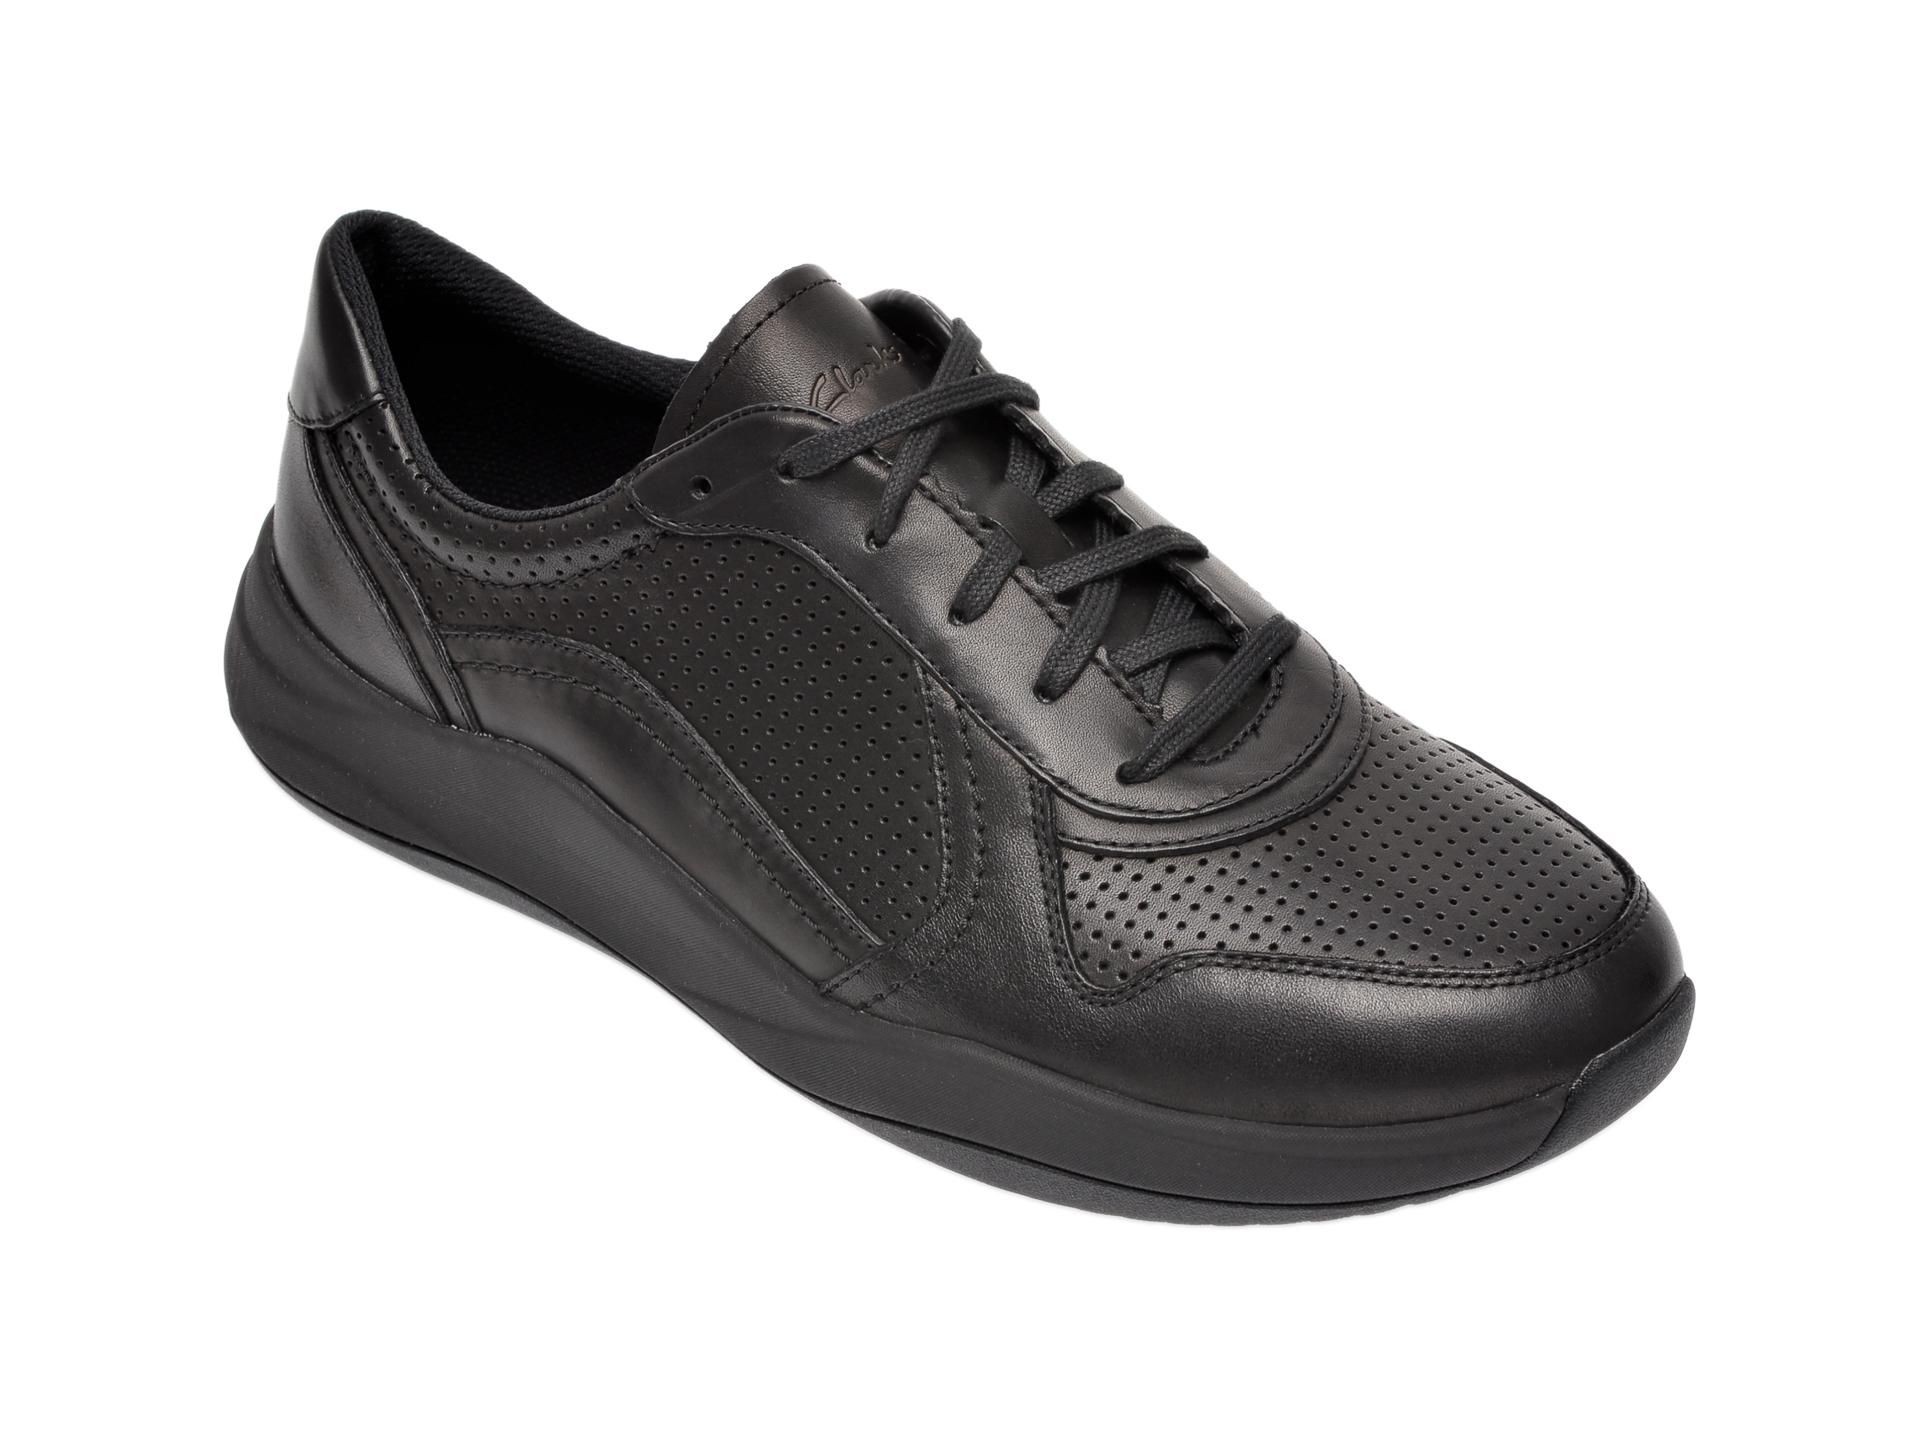 Pantofi sport CLARKS negri, Sift Speed, din piele naturala imagine otter.ro